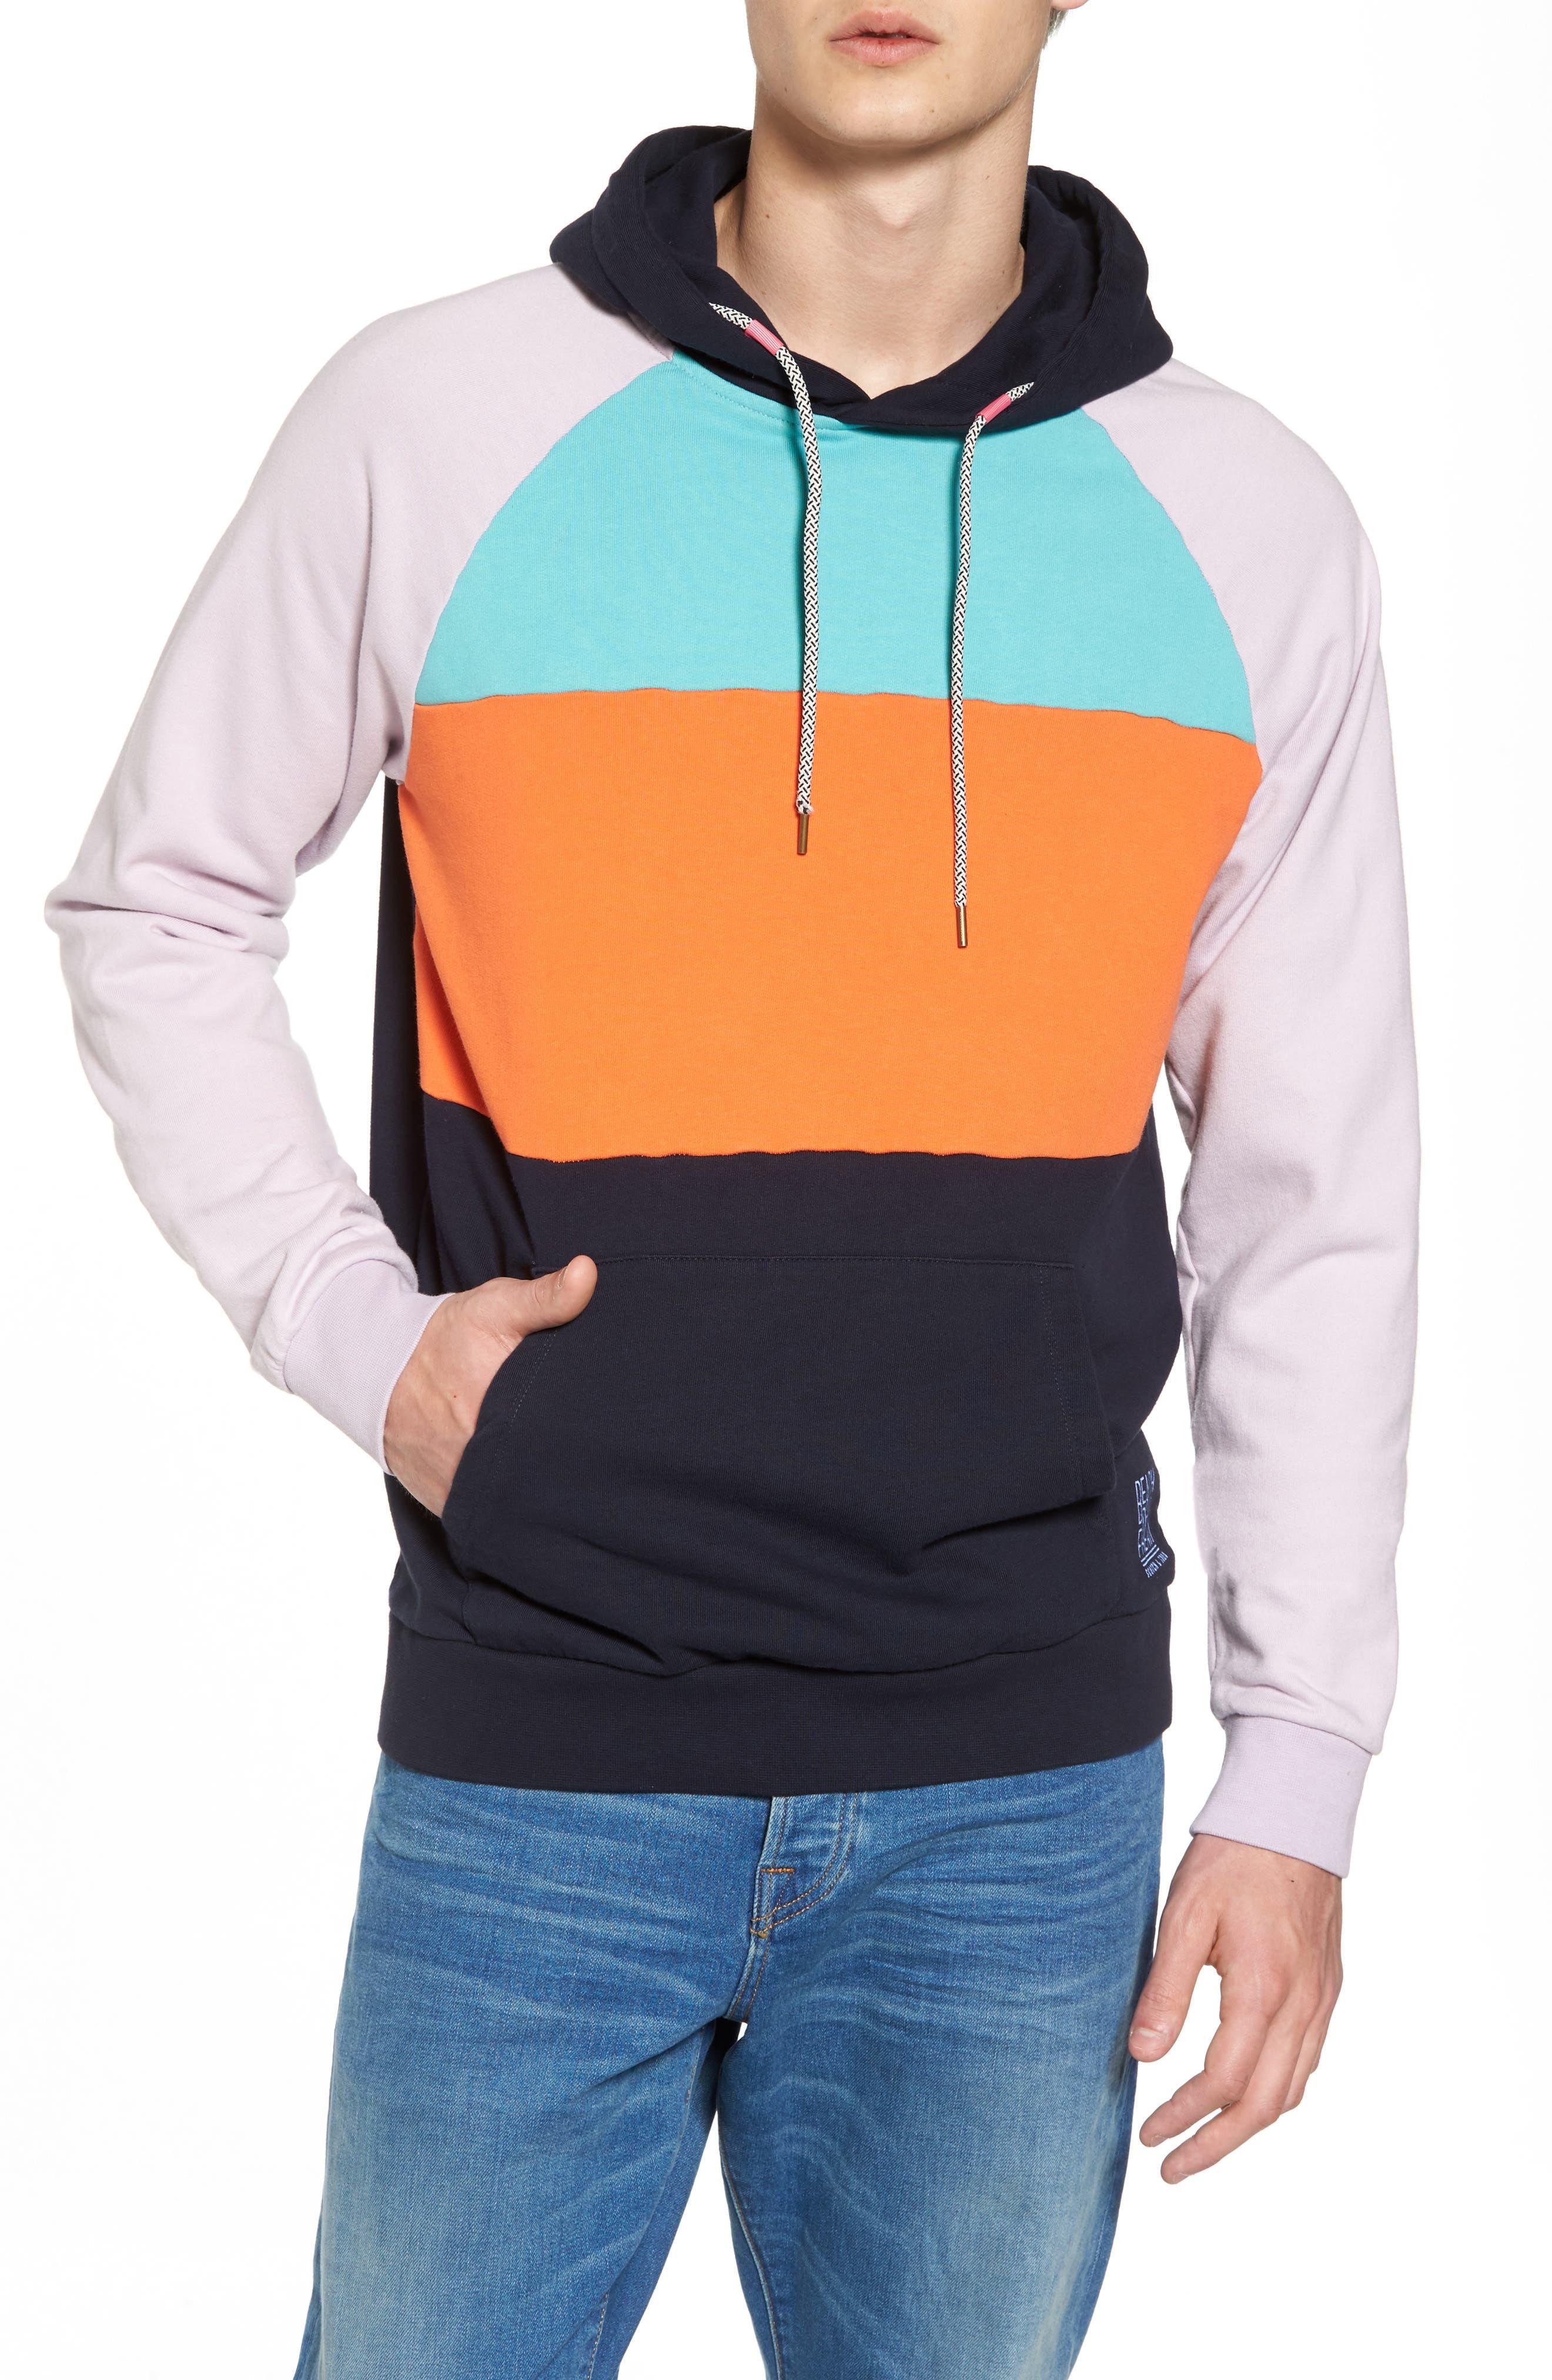 Summer Colorblock Hoodie Sweatshirt,                         Main,                         color, 100